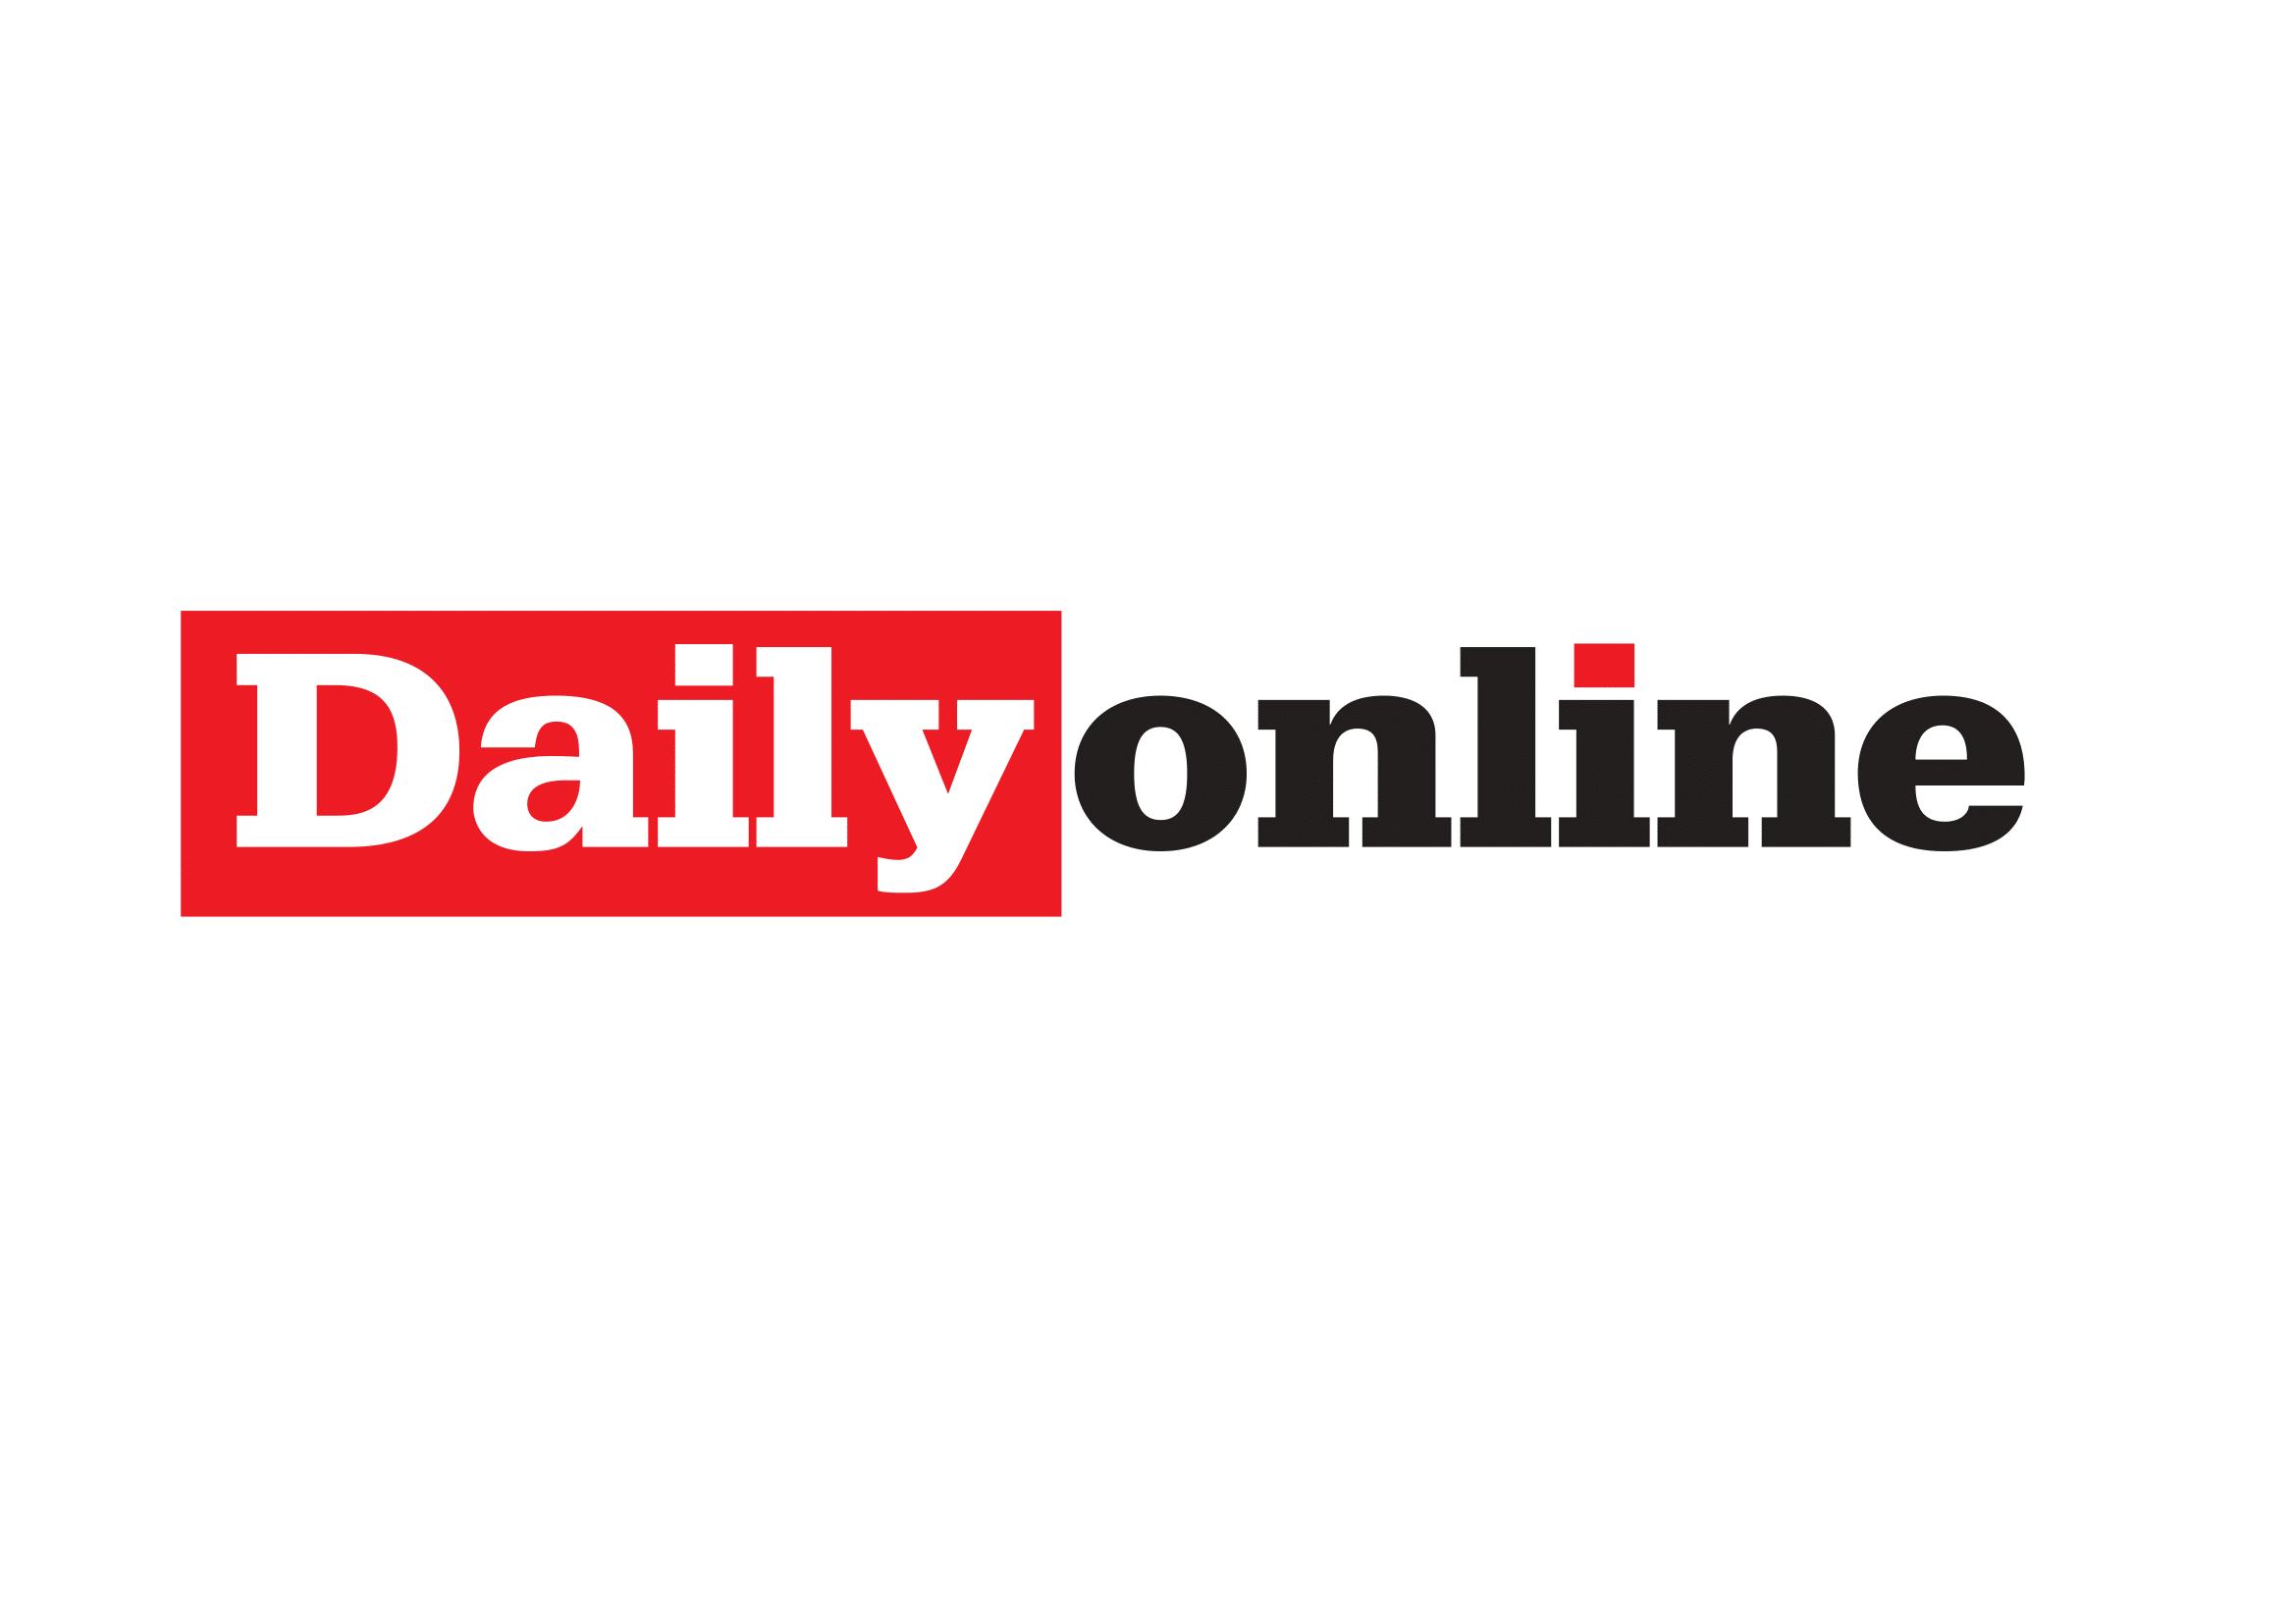 Dailyonline